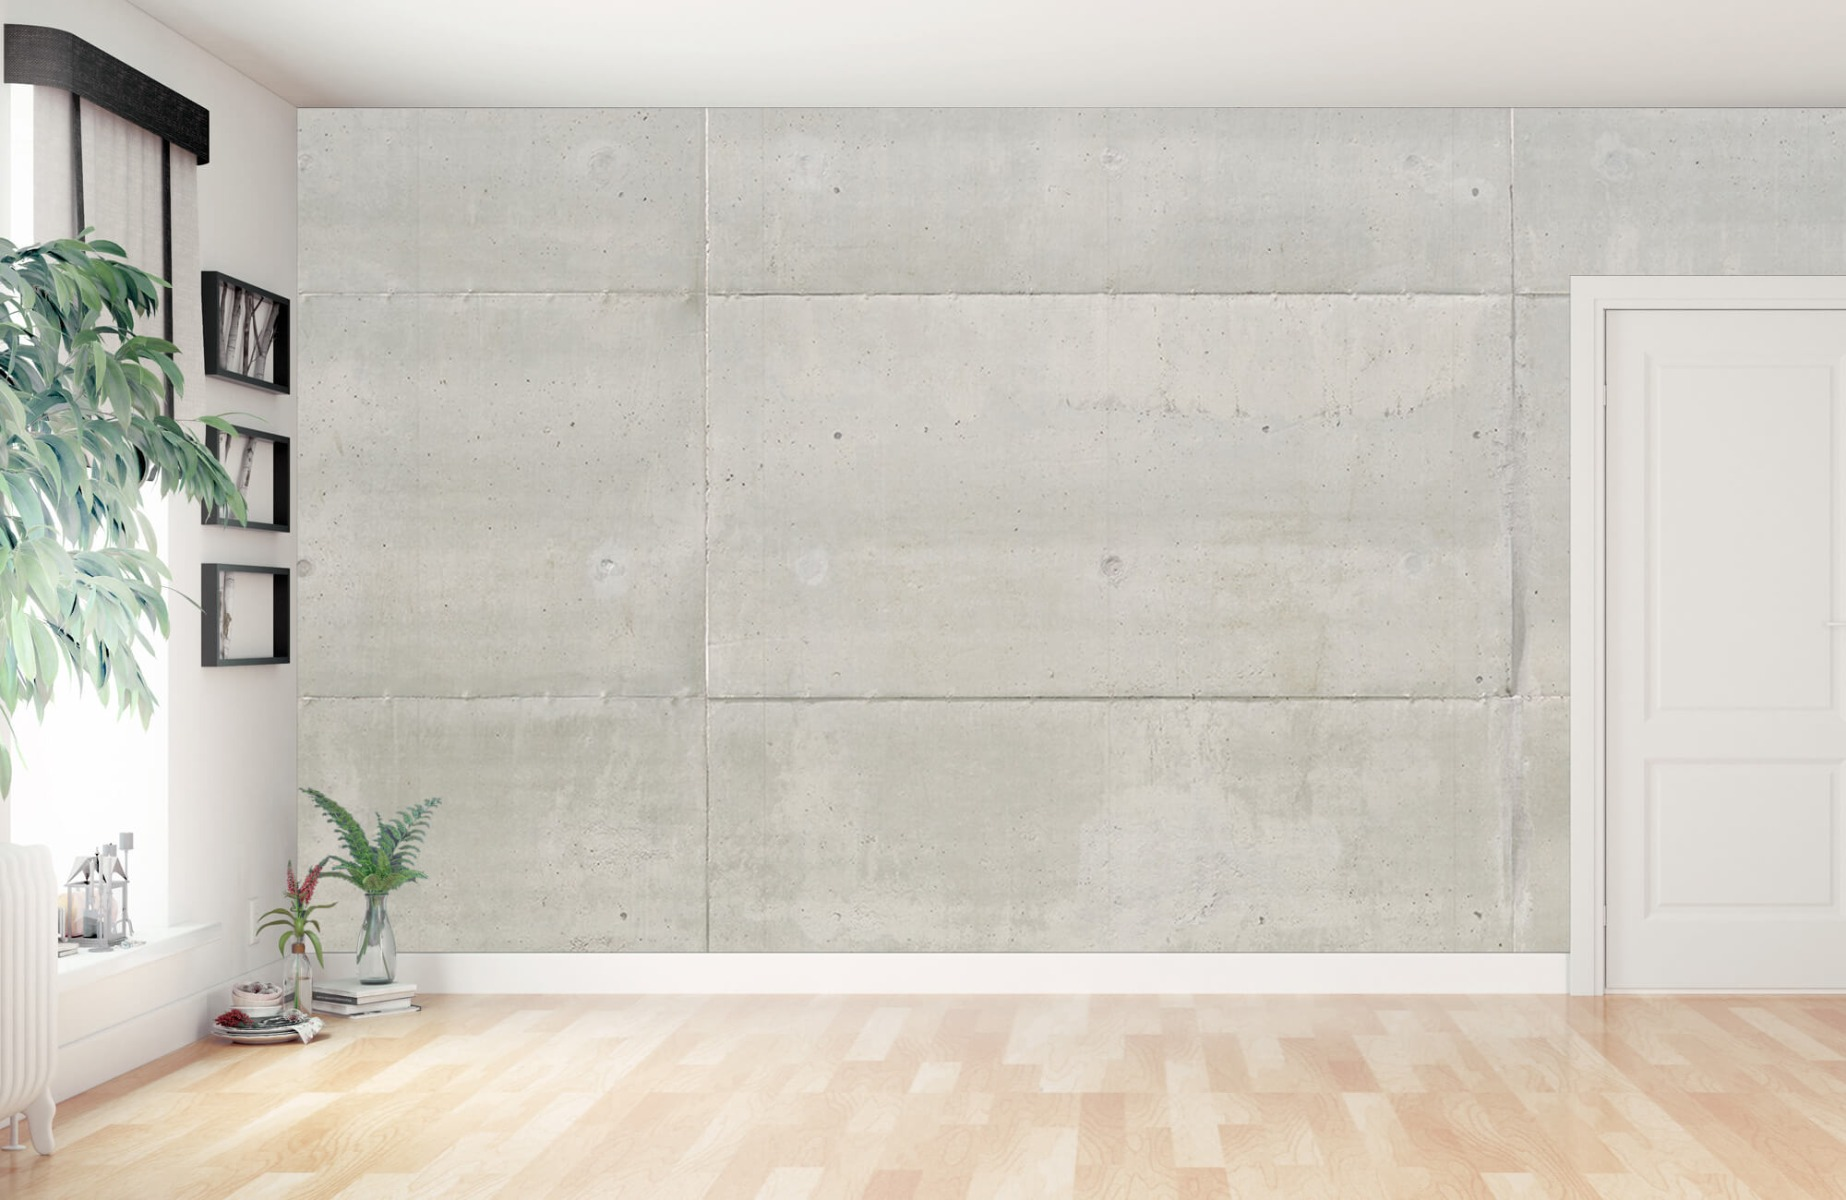 Betonlook behang - Betonnen platen - Wallexclusive - Vergaderruimte 15